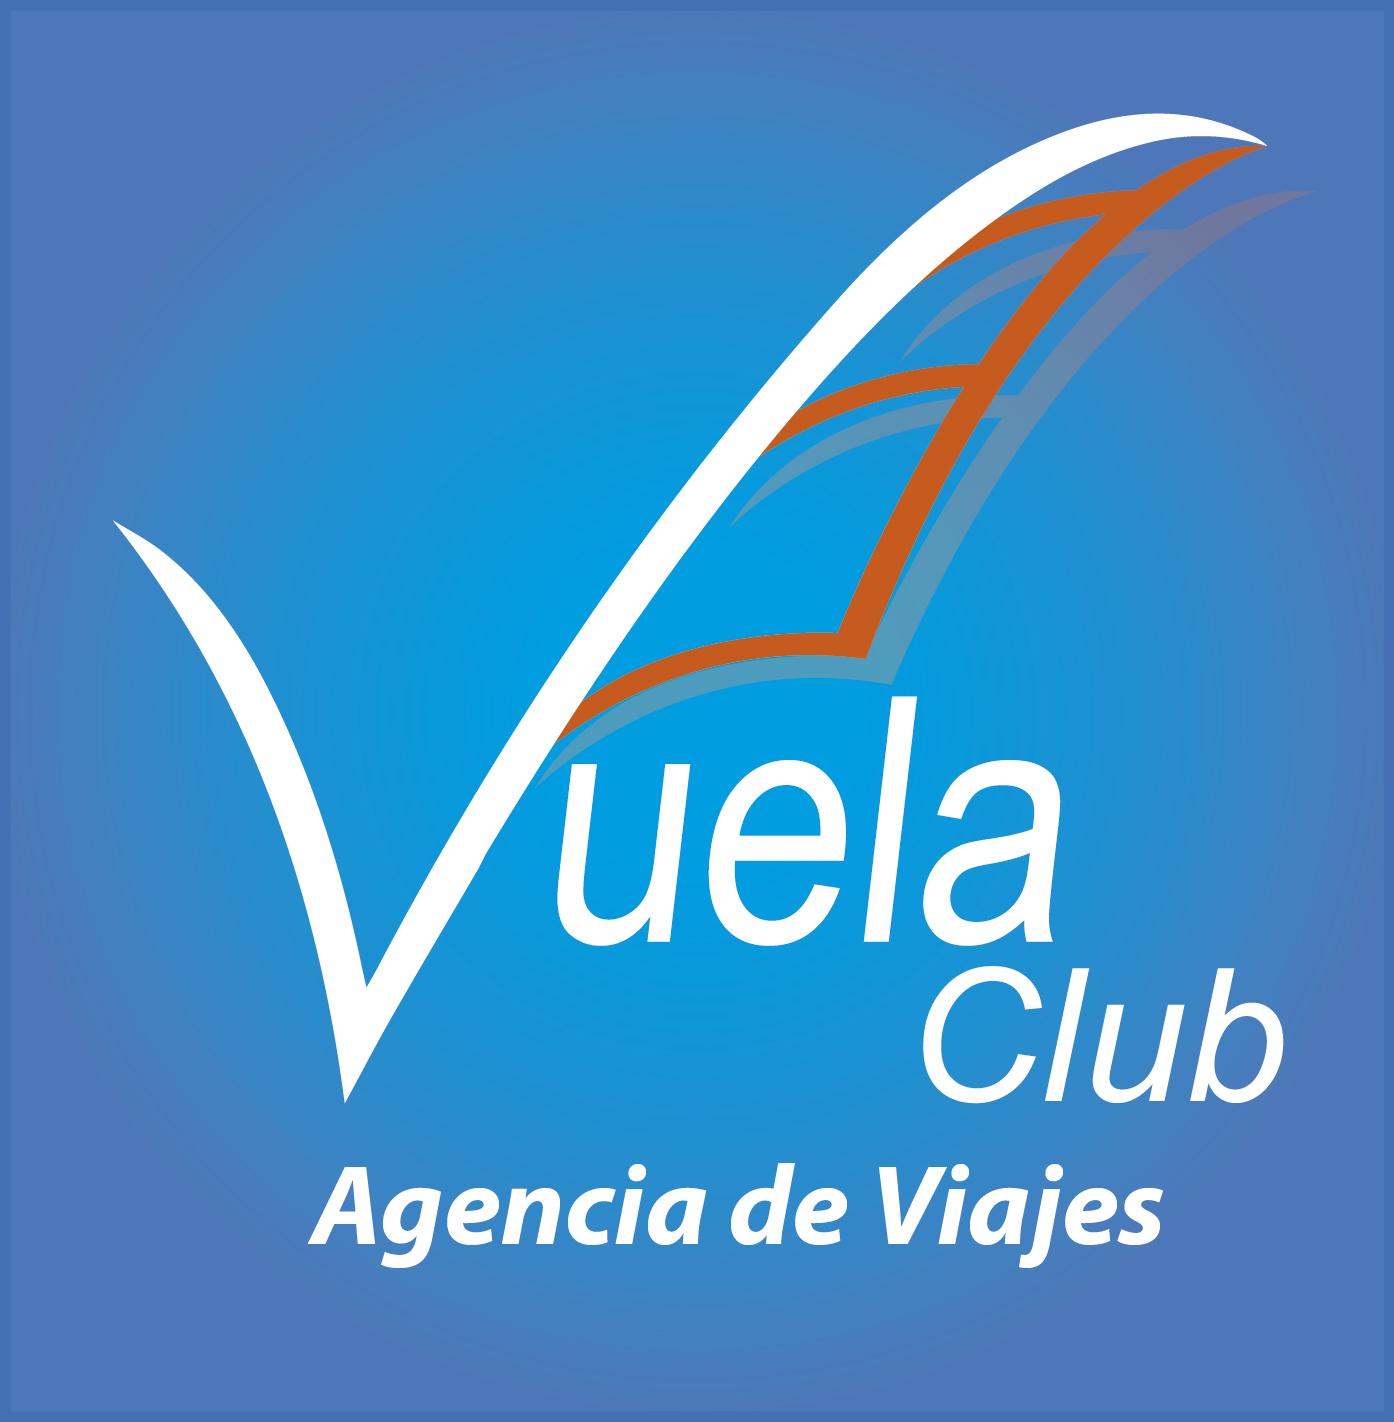 Turismo Vuela Club